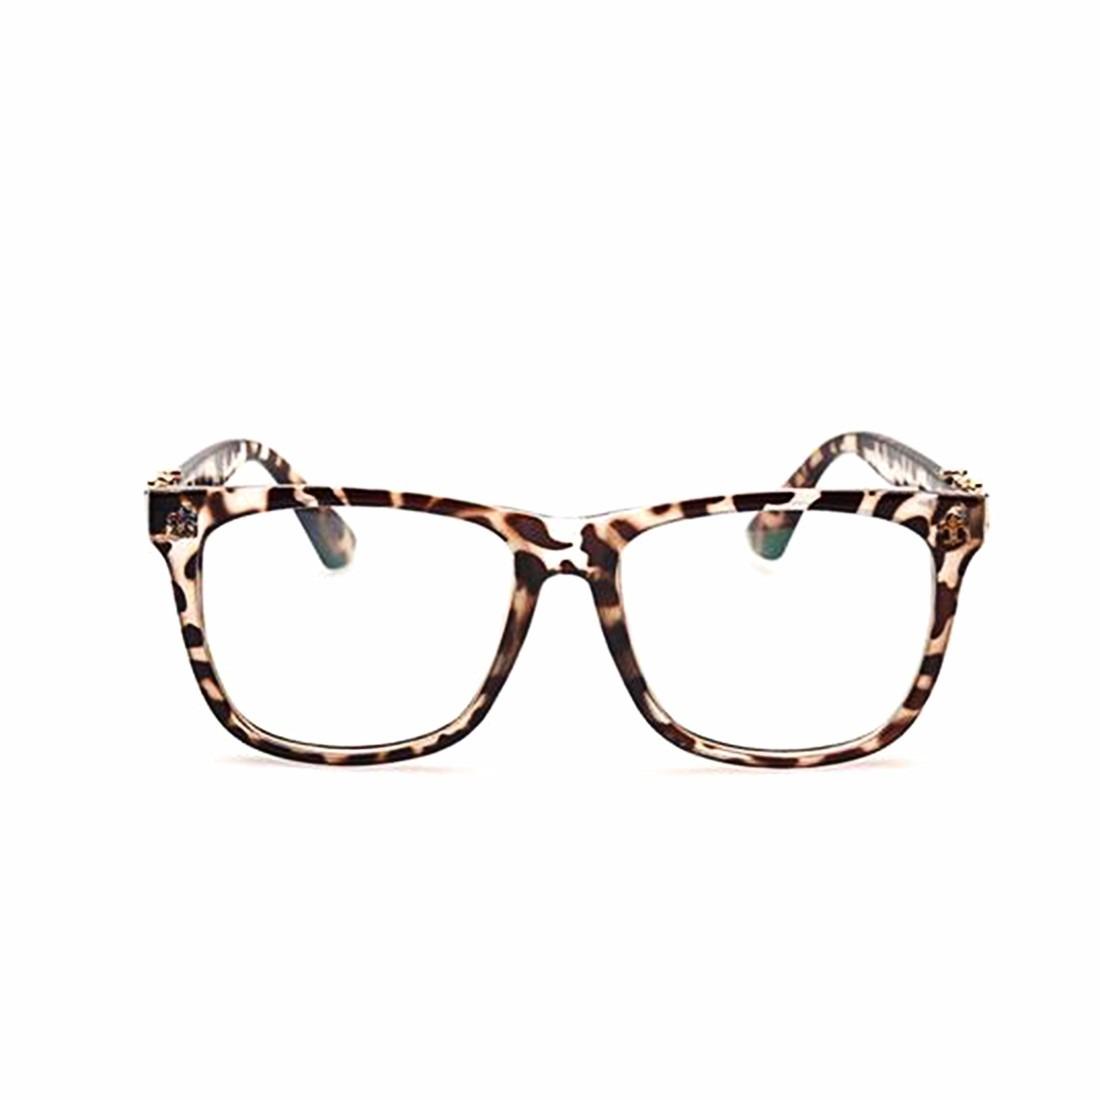 8eacae590fe26 kit 3 óculos acetato quadrado s grau acessório descanso br. Carregando zoom.